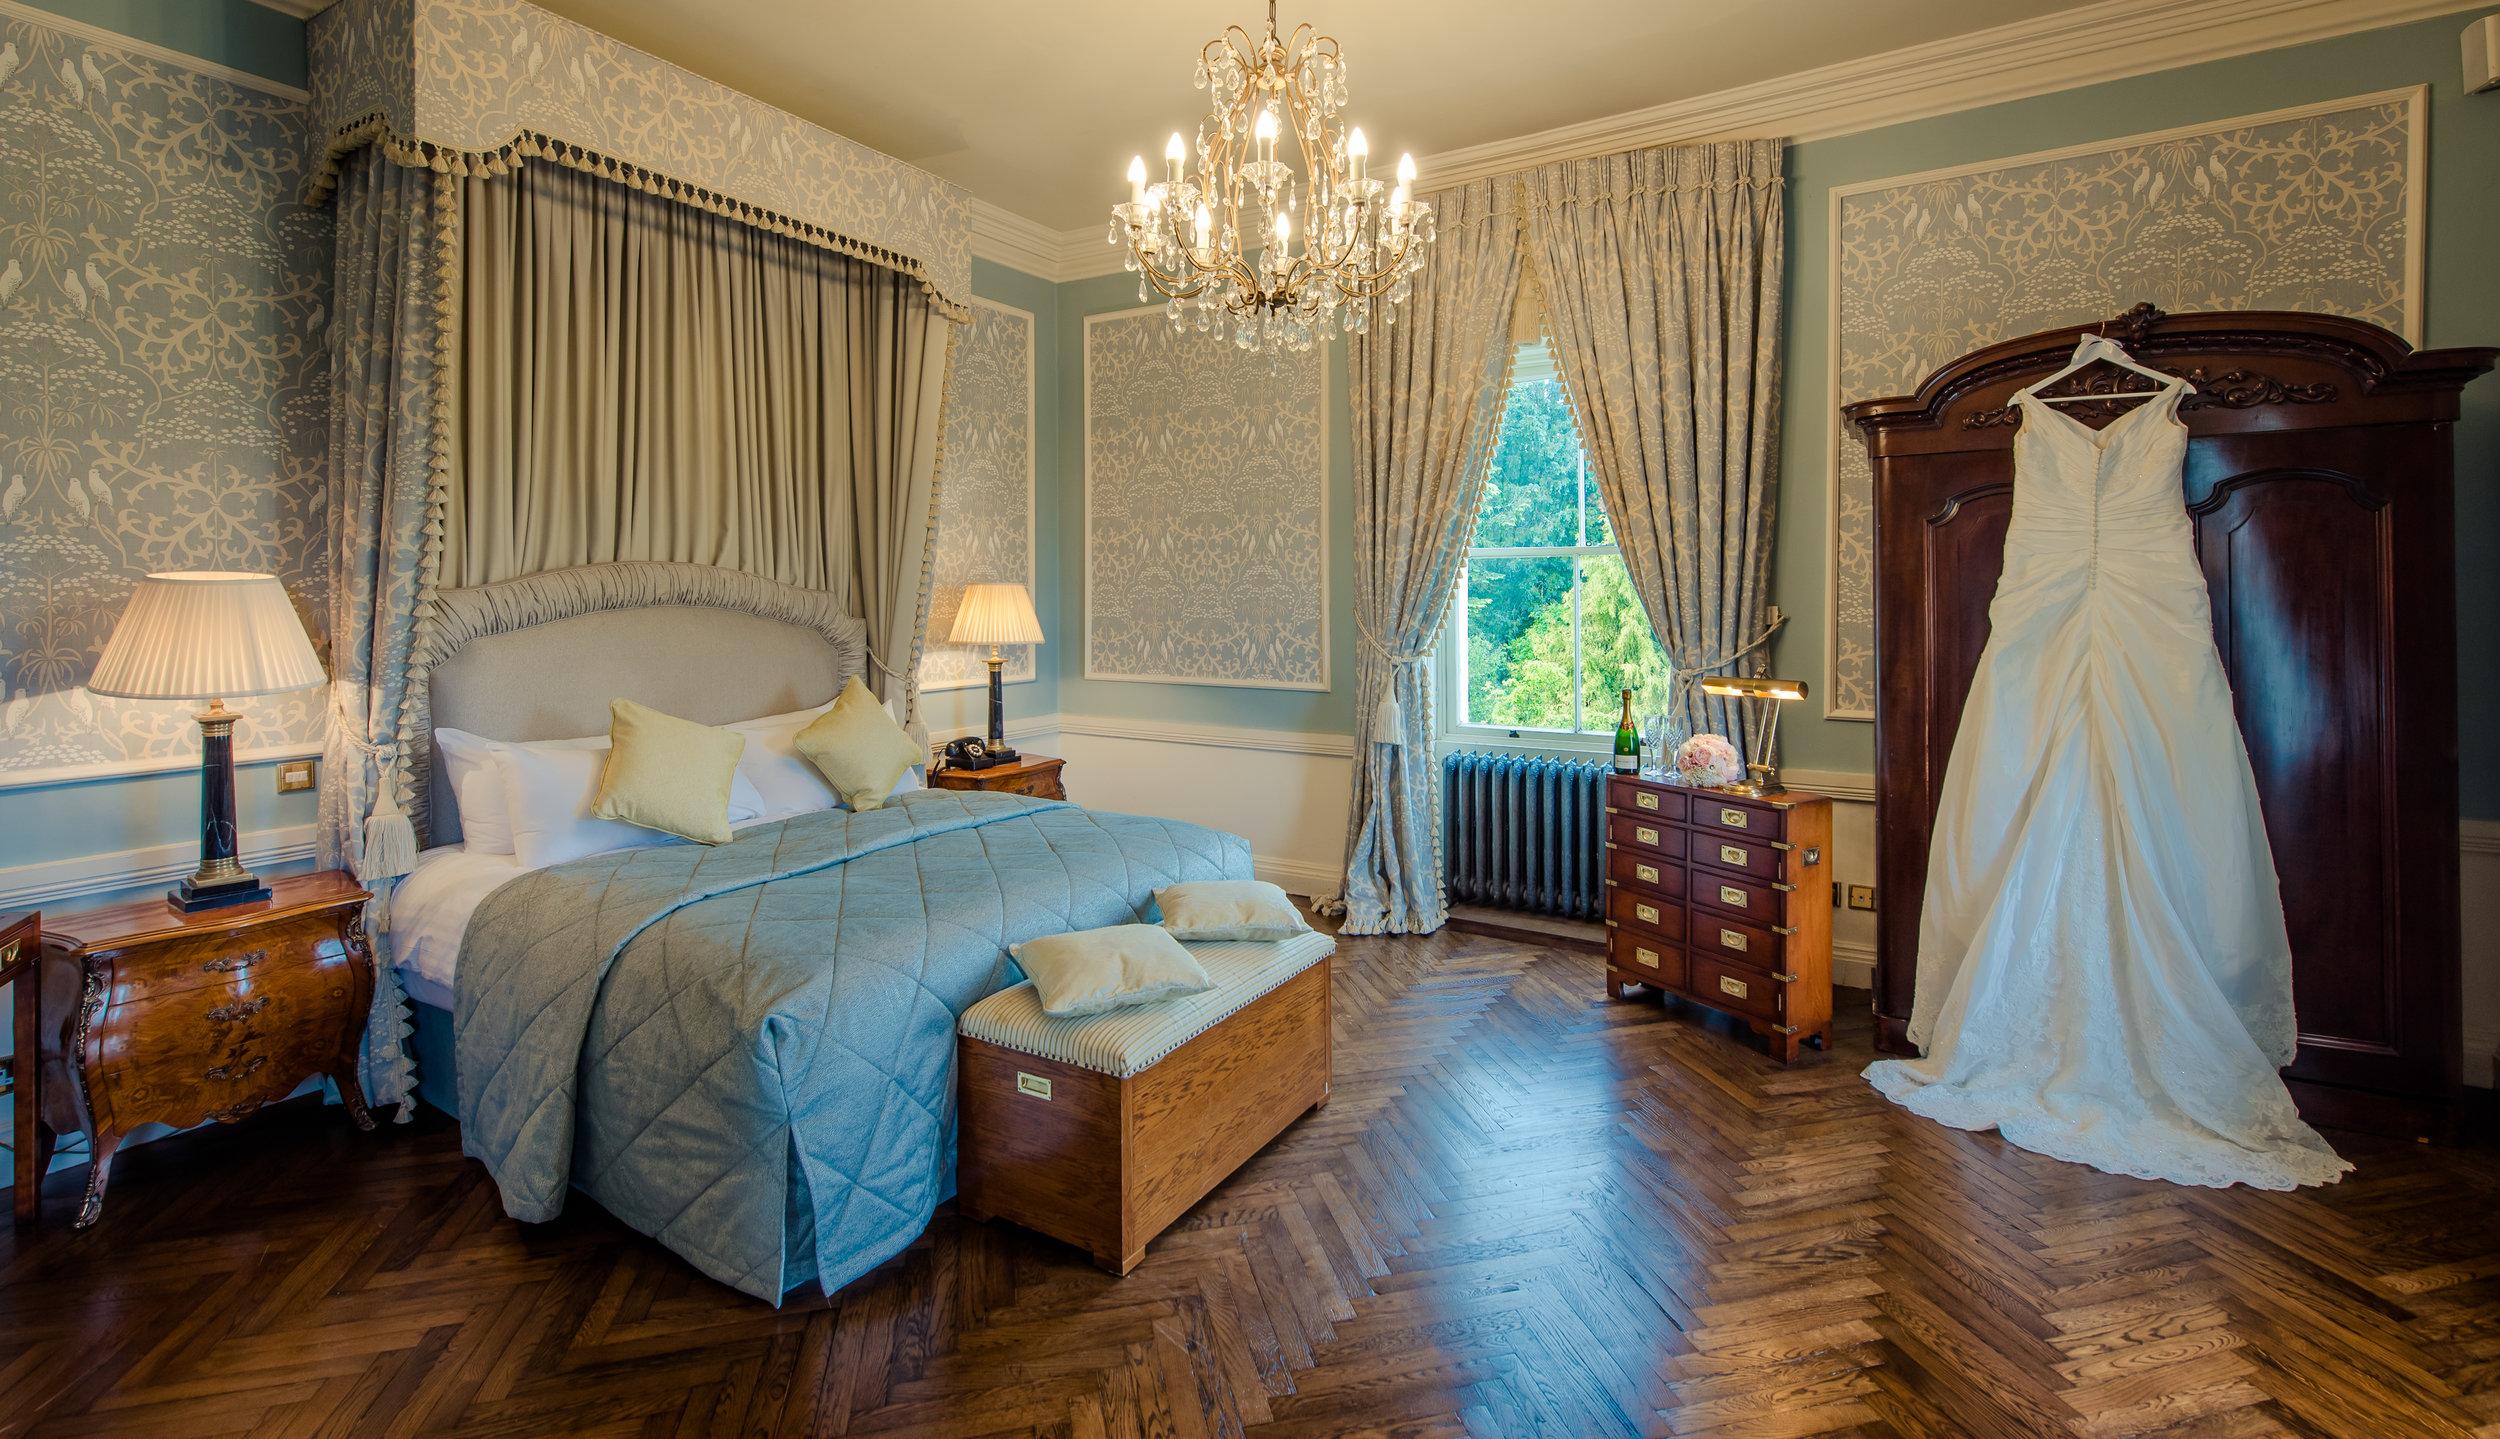 Tulfarris Hotel & Golf Resort Wych Hazel bridal suite with wedding dress hanging up.jpg